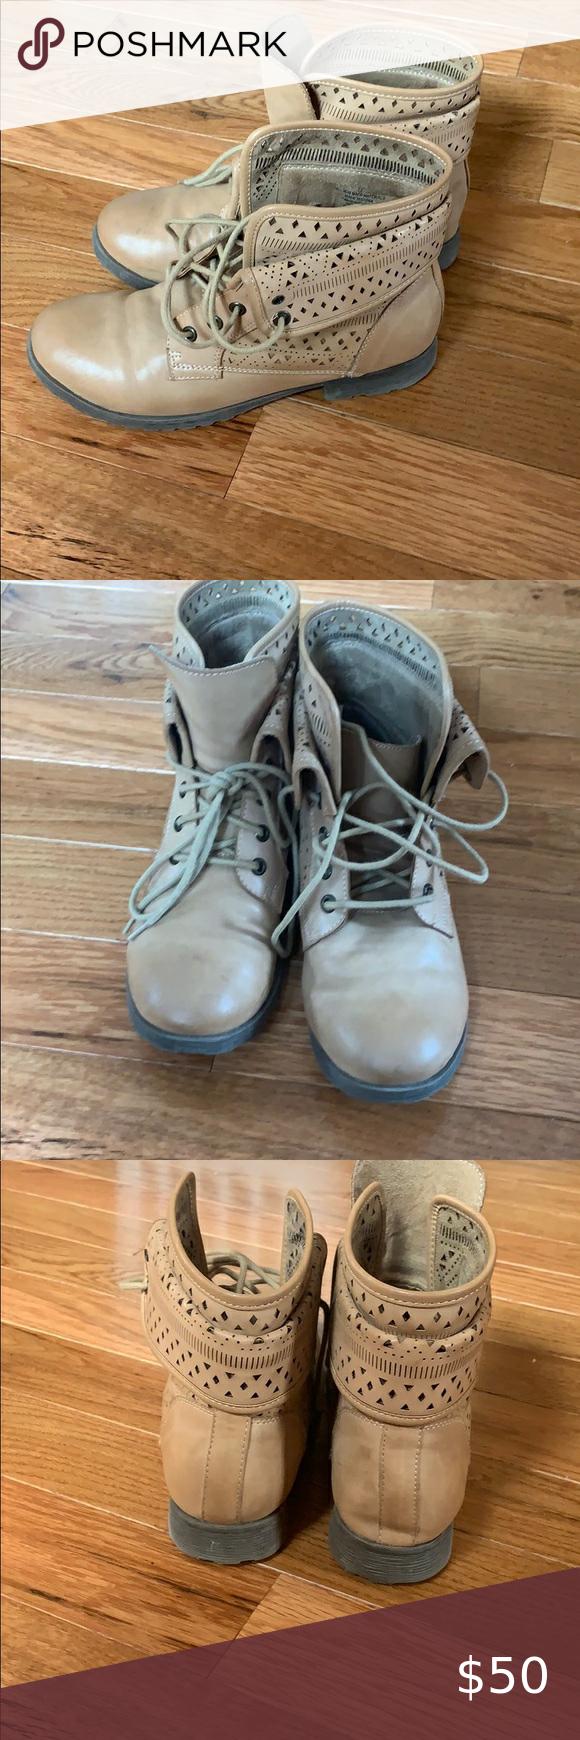 Justice Boots Justice Boots Justice Shoes Boots